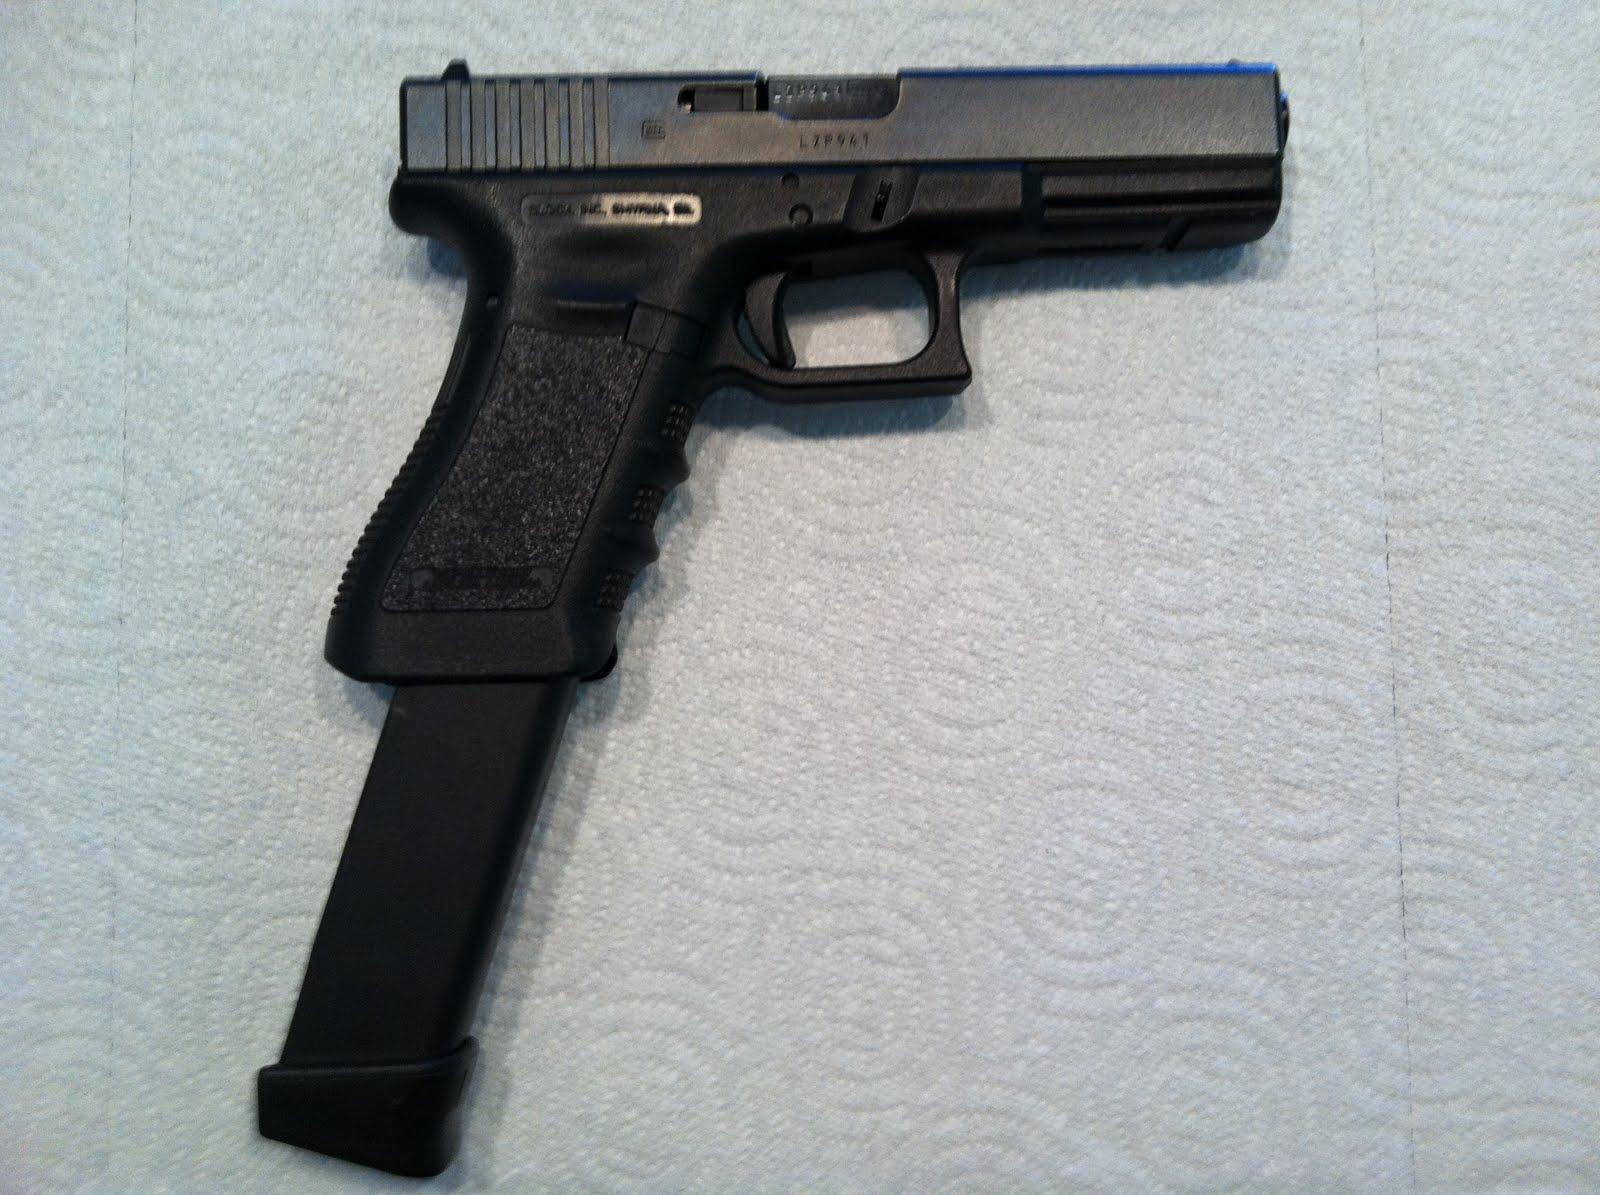 donlin firearms llc gun talk and reviews glock 17 review